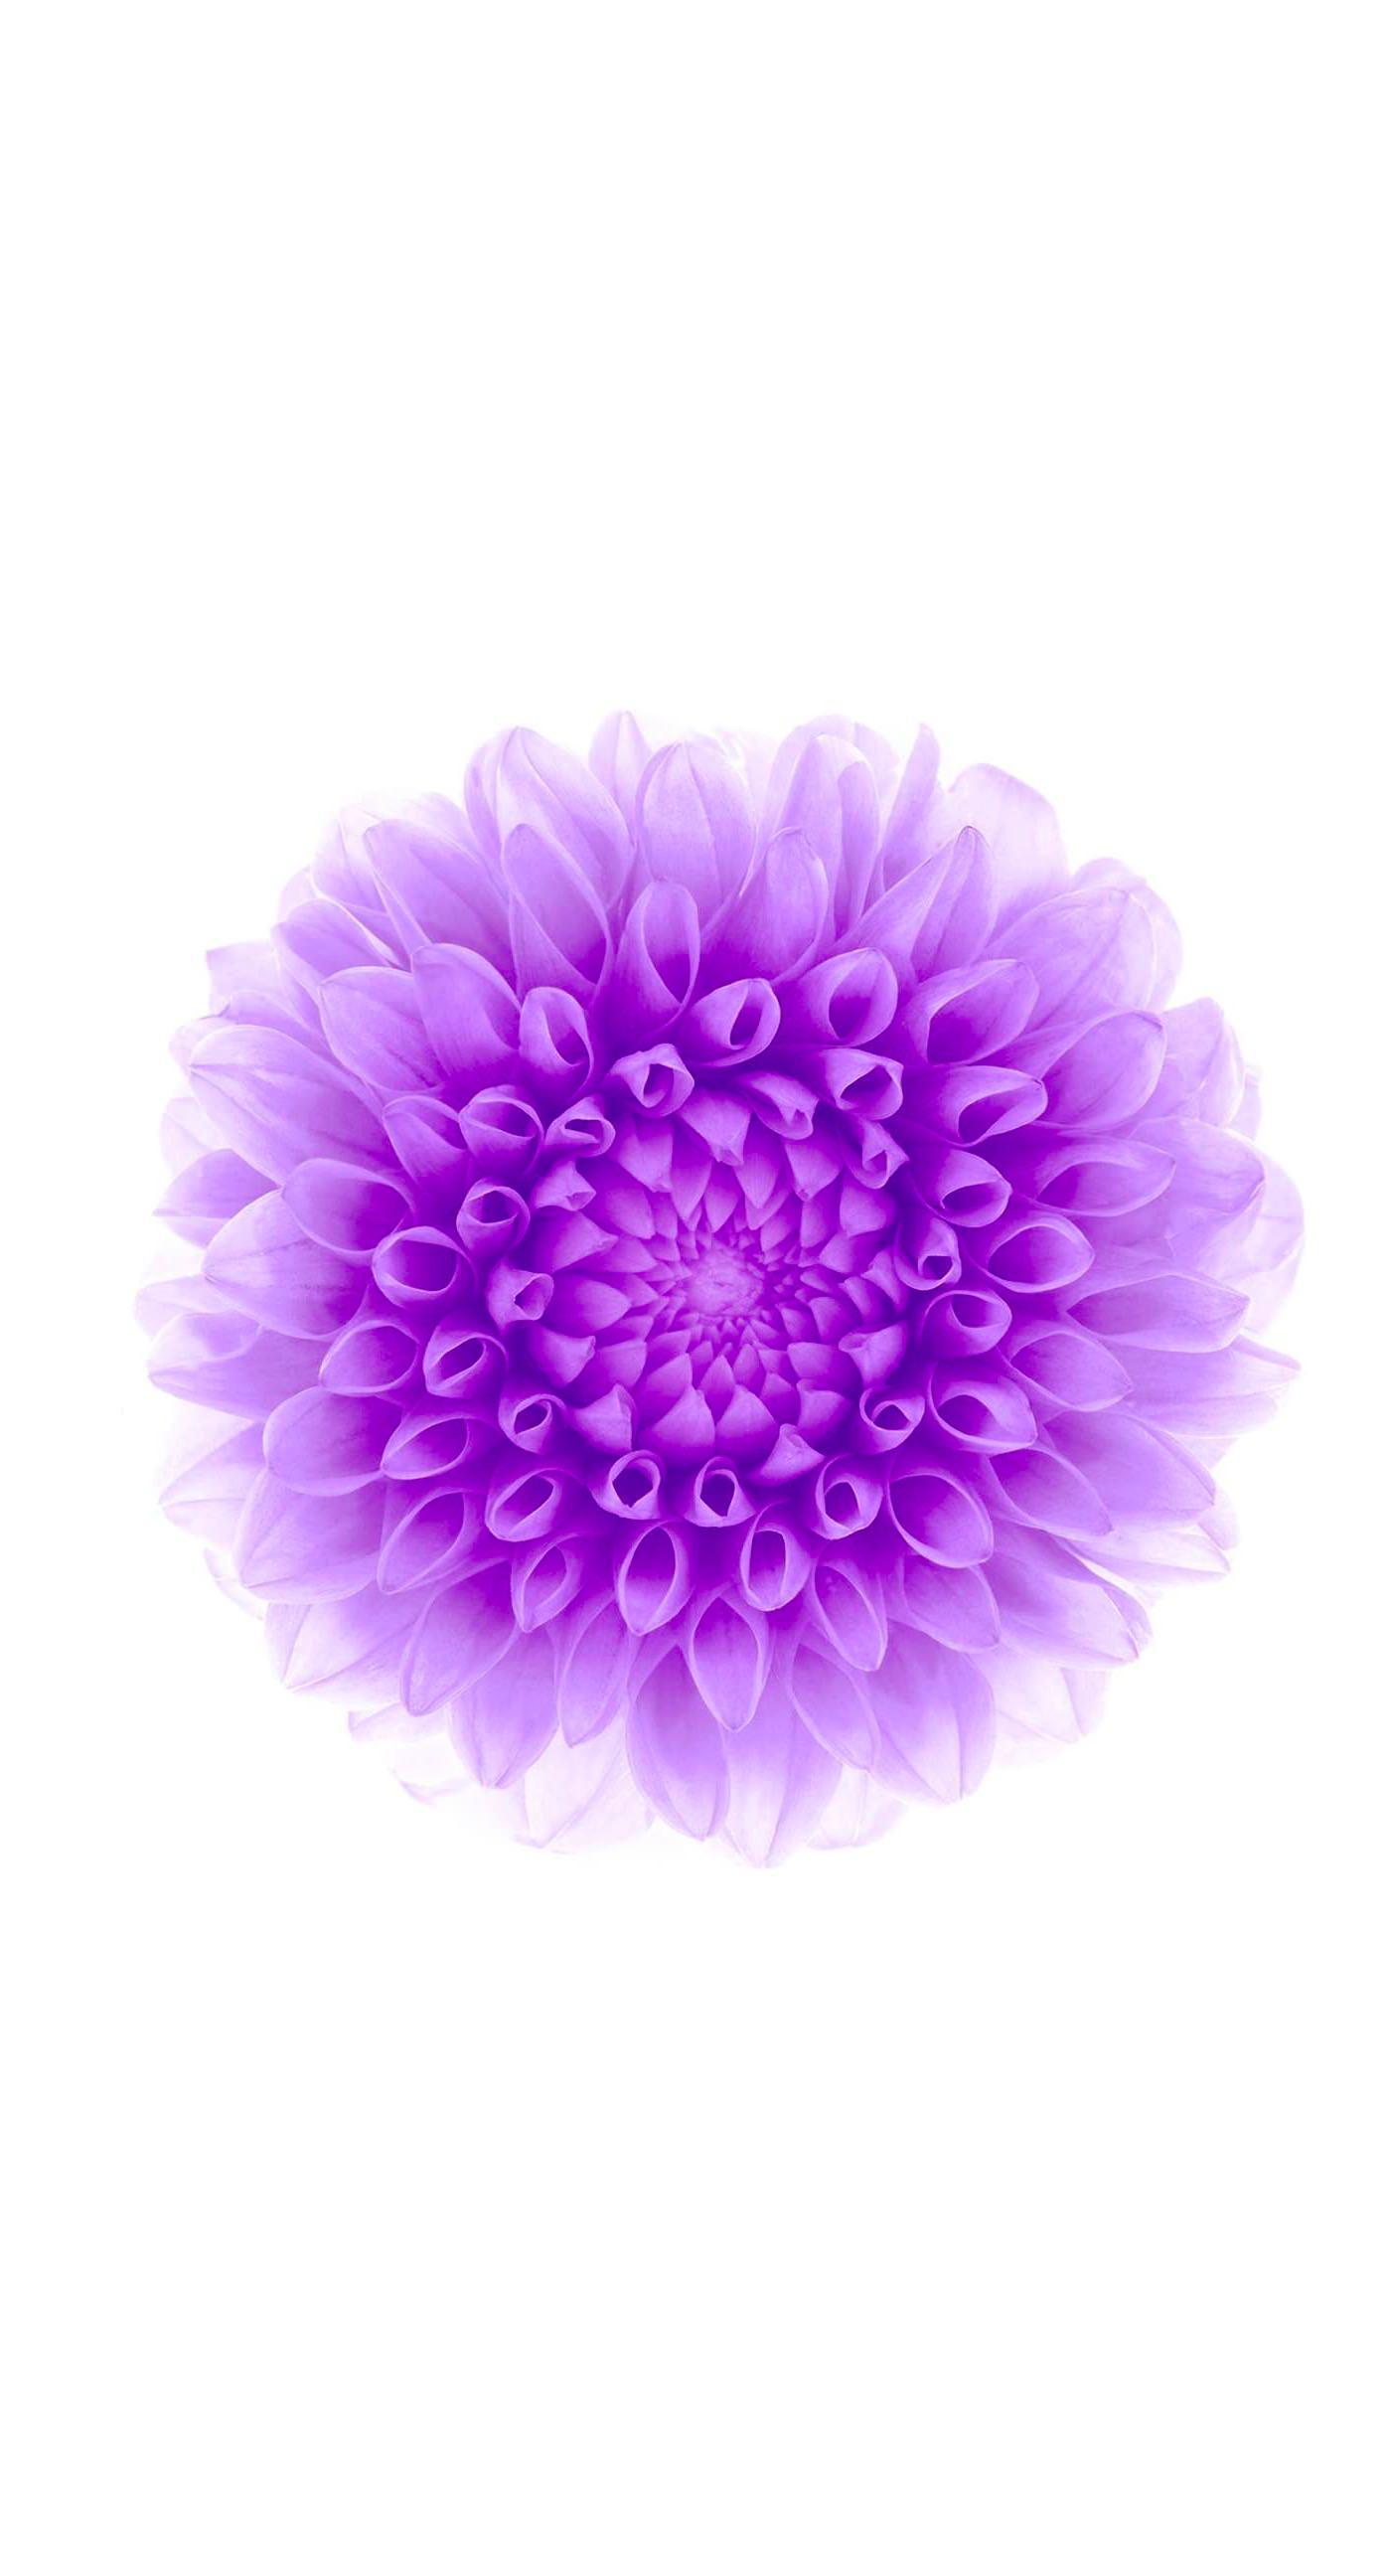 Flower purple white wallpaper iphone7plus flowerpurplewhite iphone 7 plus wallpaper mightylinksfo